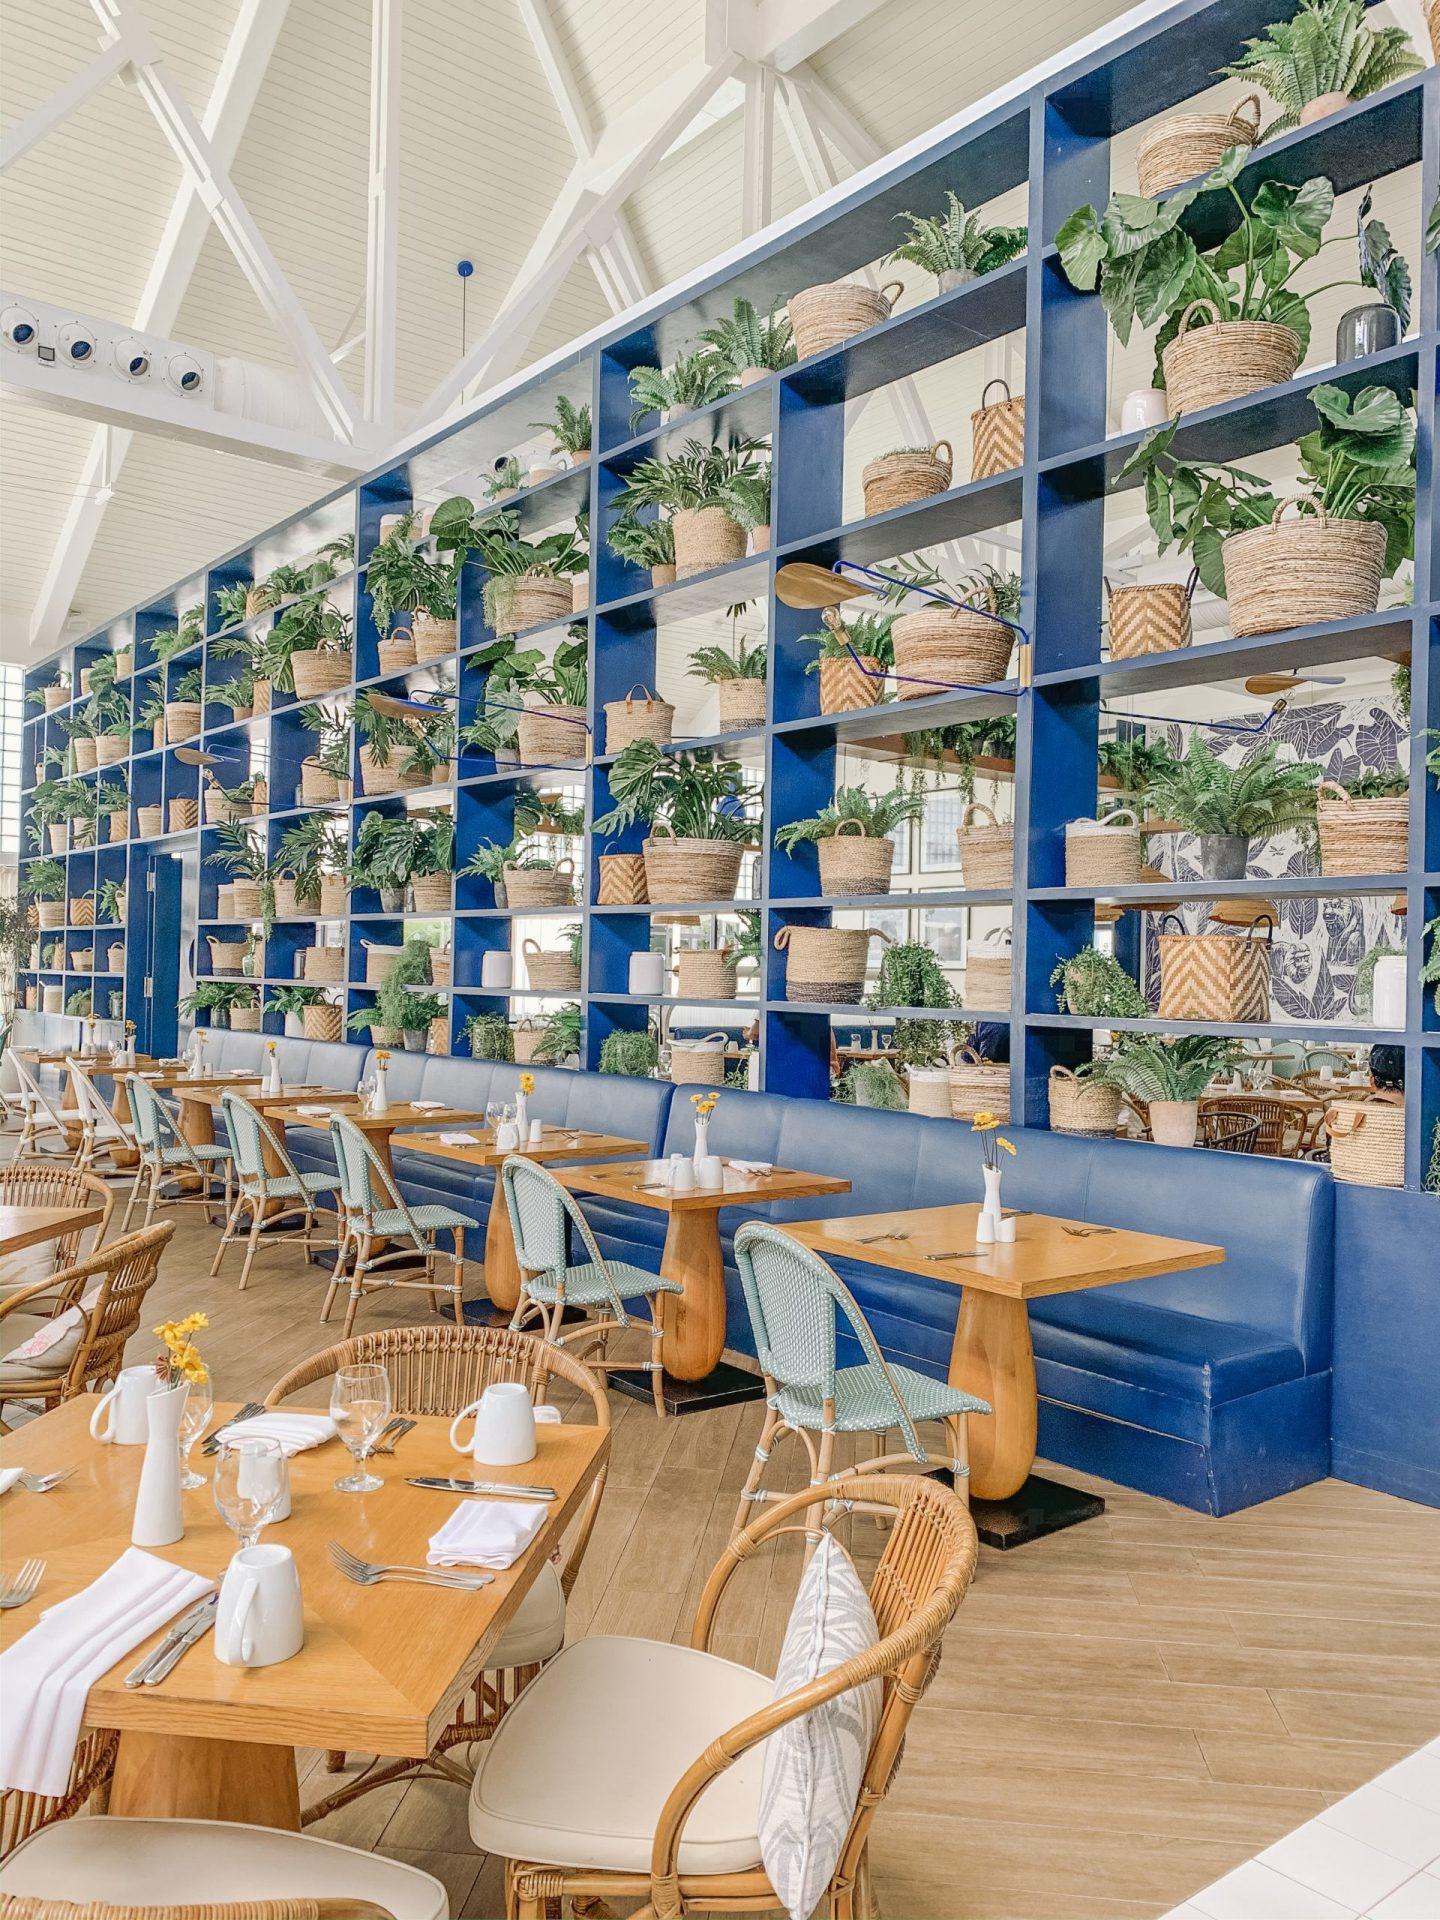 Ocean Riviera Paradise Review, Amaranto Buffet Restaurant